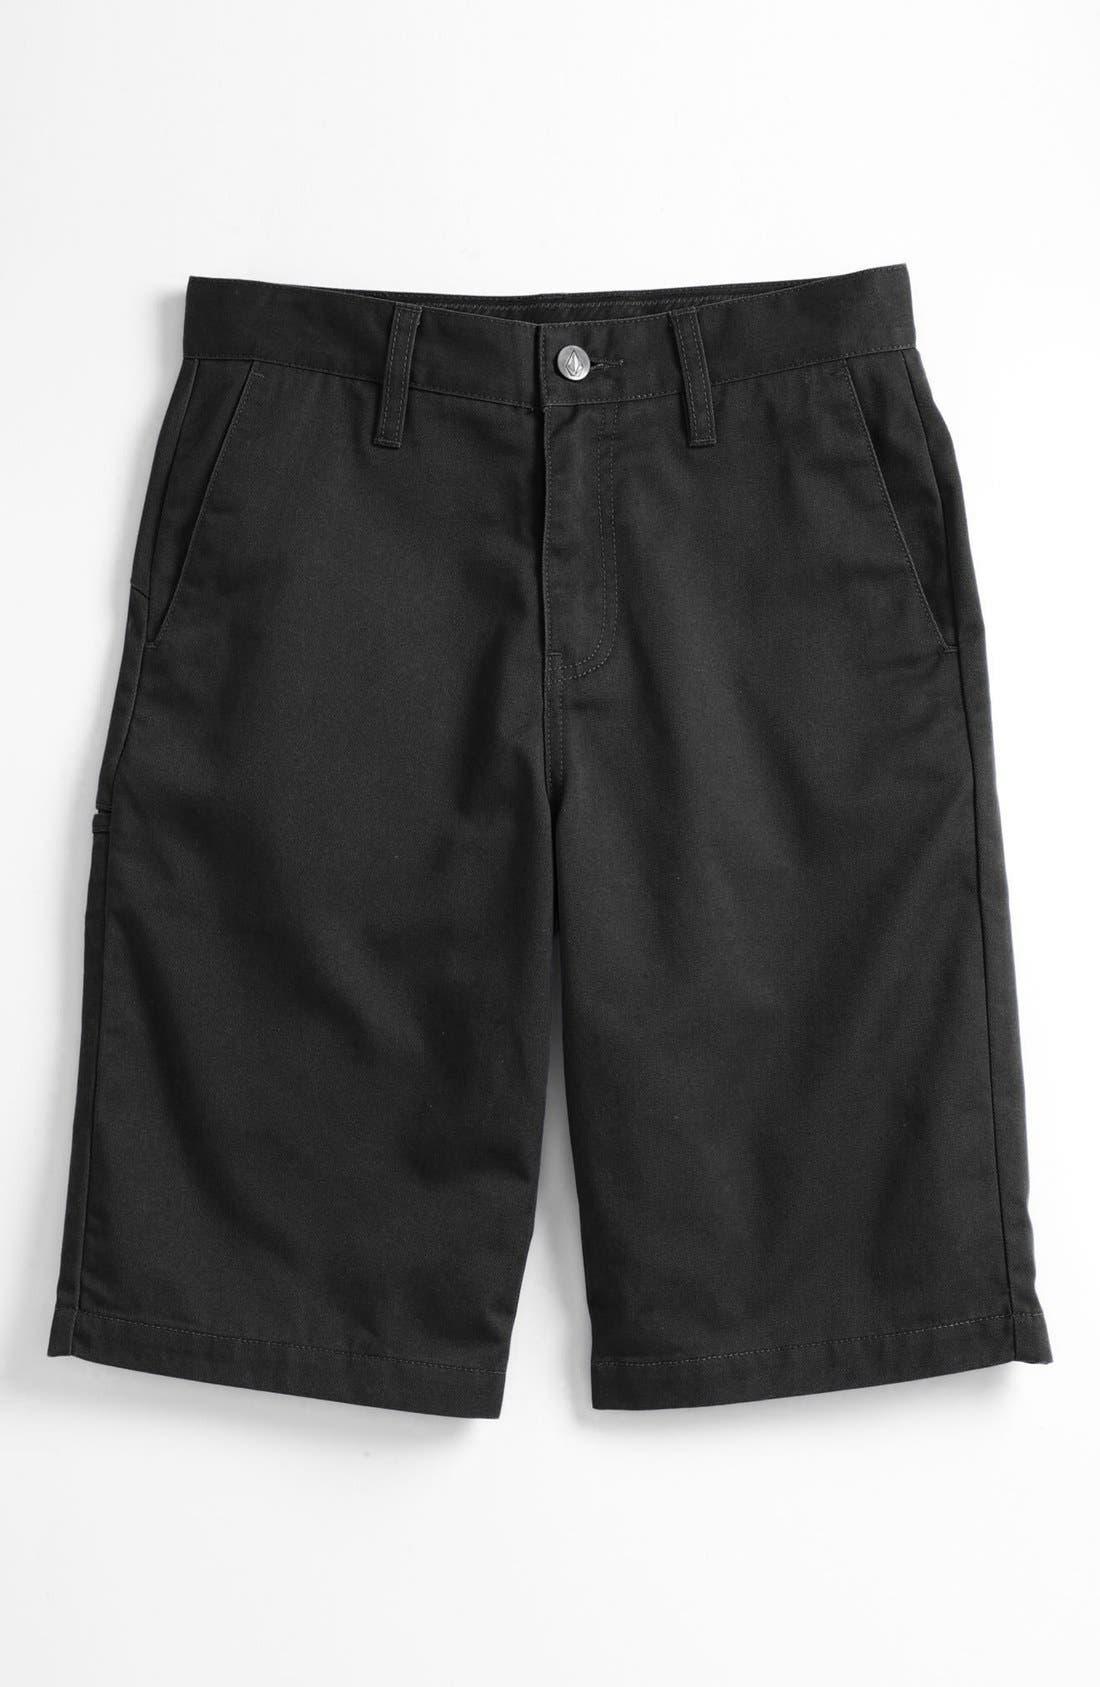 Main Image - Volcom 'Friendly' Chino Shorts (Big Boys)